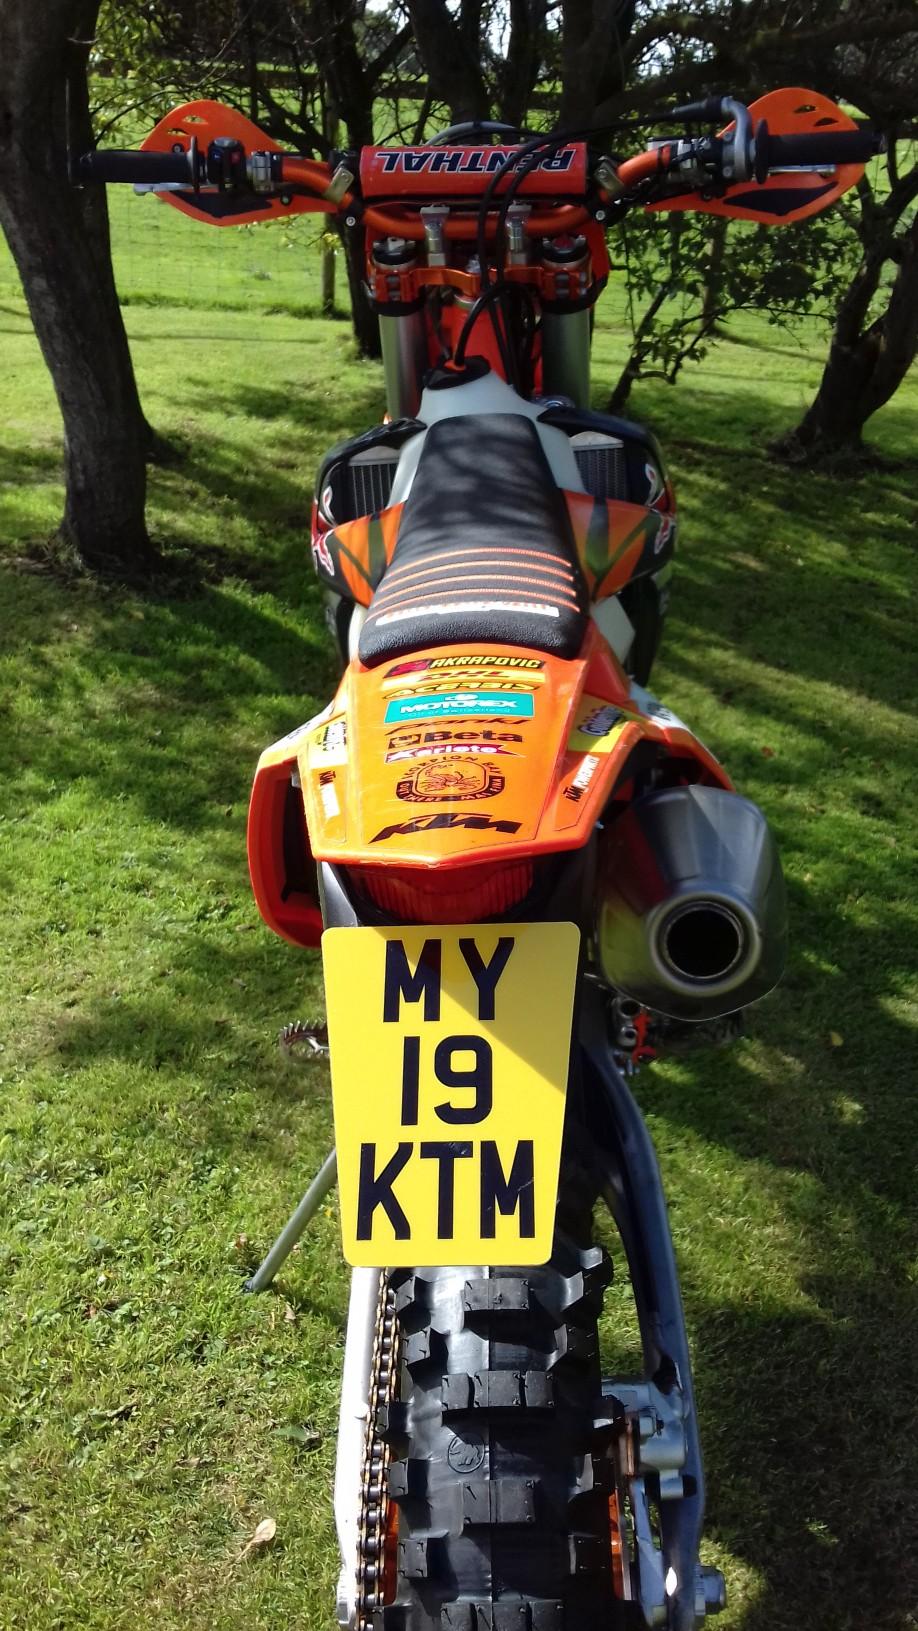 Larger Tapered Enduro Motorcycle Flexi Reg Number Plate Ktm Exc Mbx Graffix